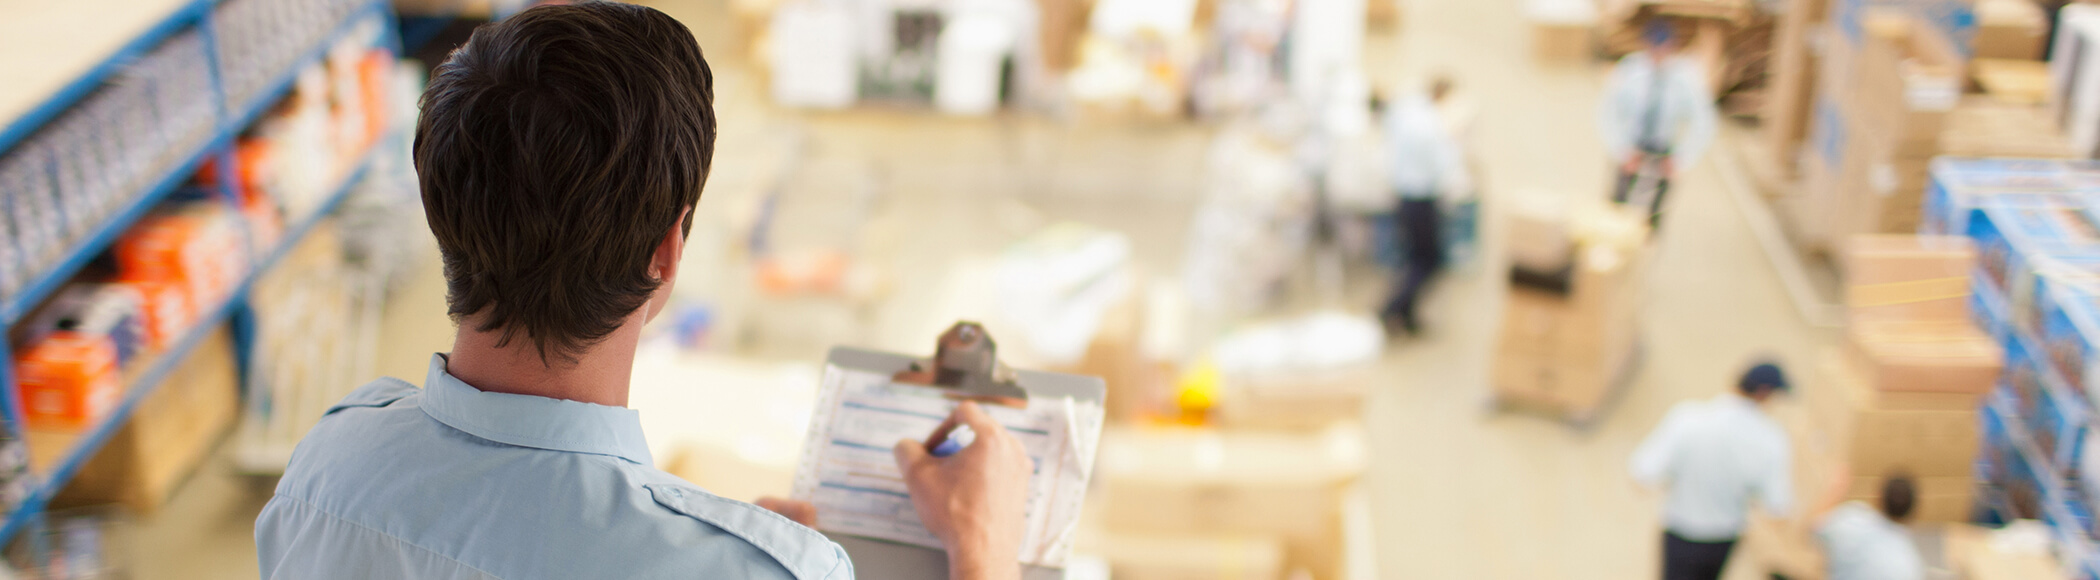 banca intesa kredit za finansiranje i nabavku obrtnih sredstava biz obrt mali biznis